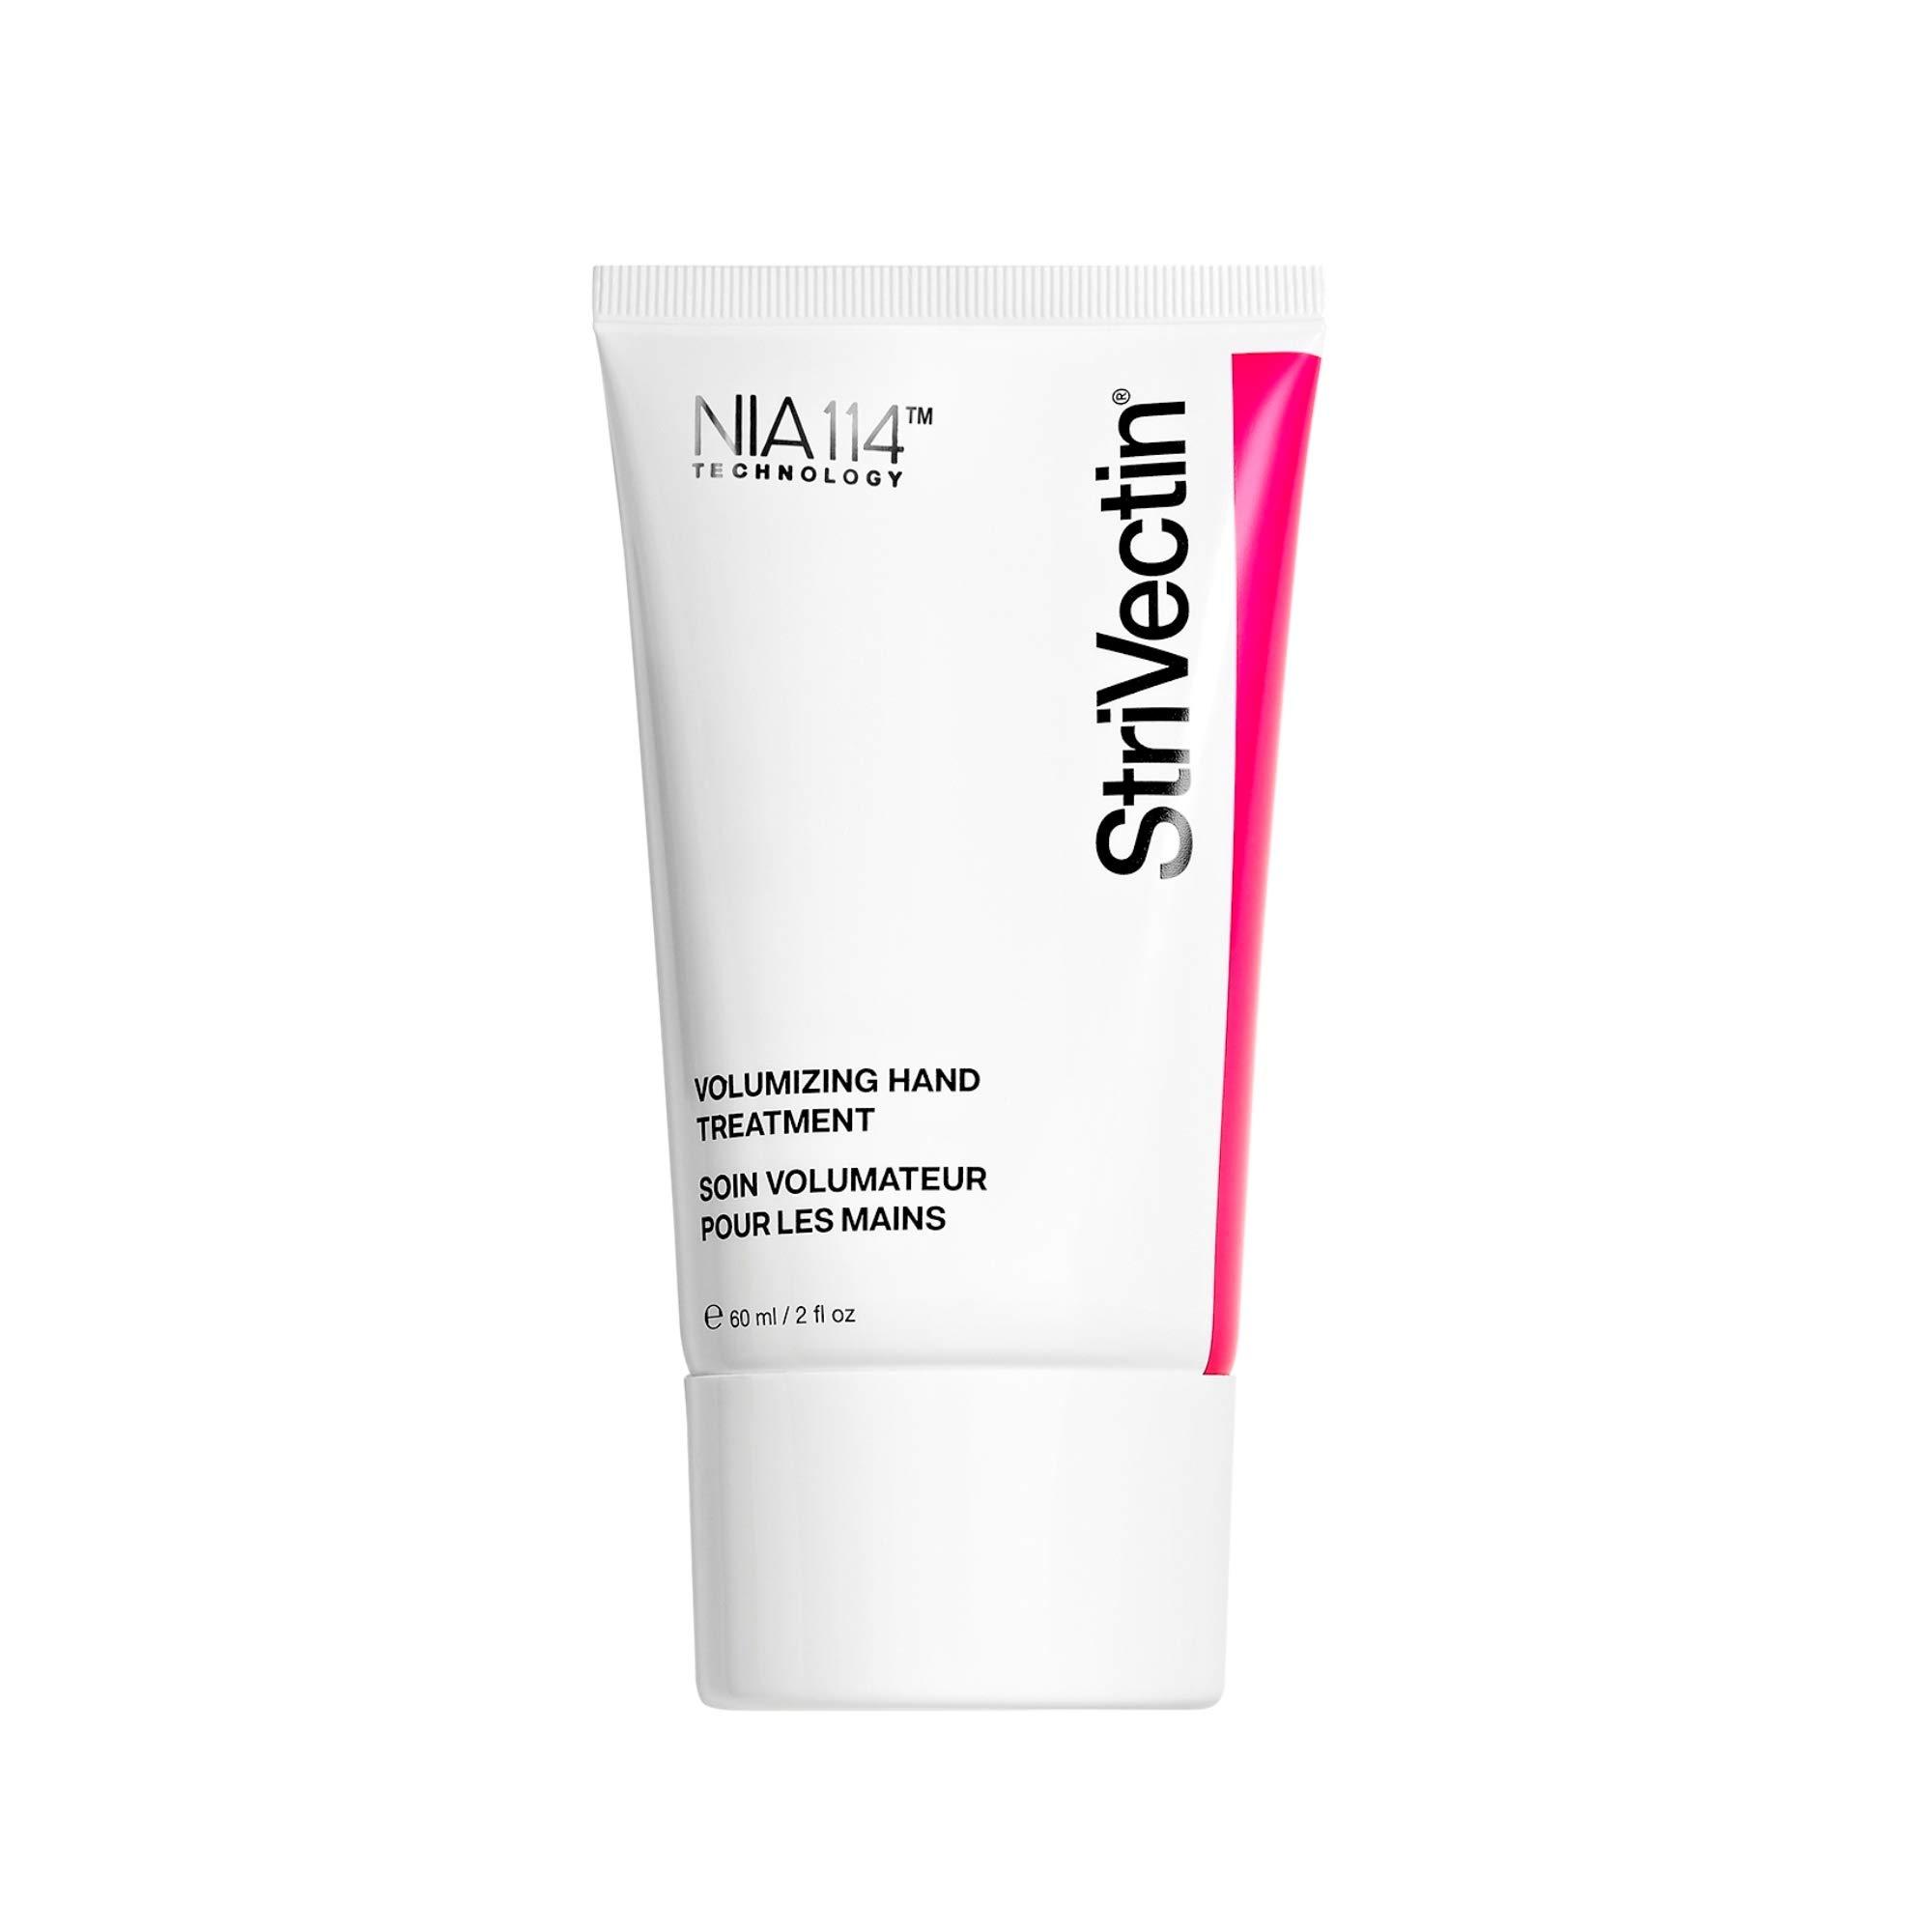 StriVectin-SD Volumizing Hand Cream, 2 Fl Oz